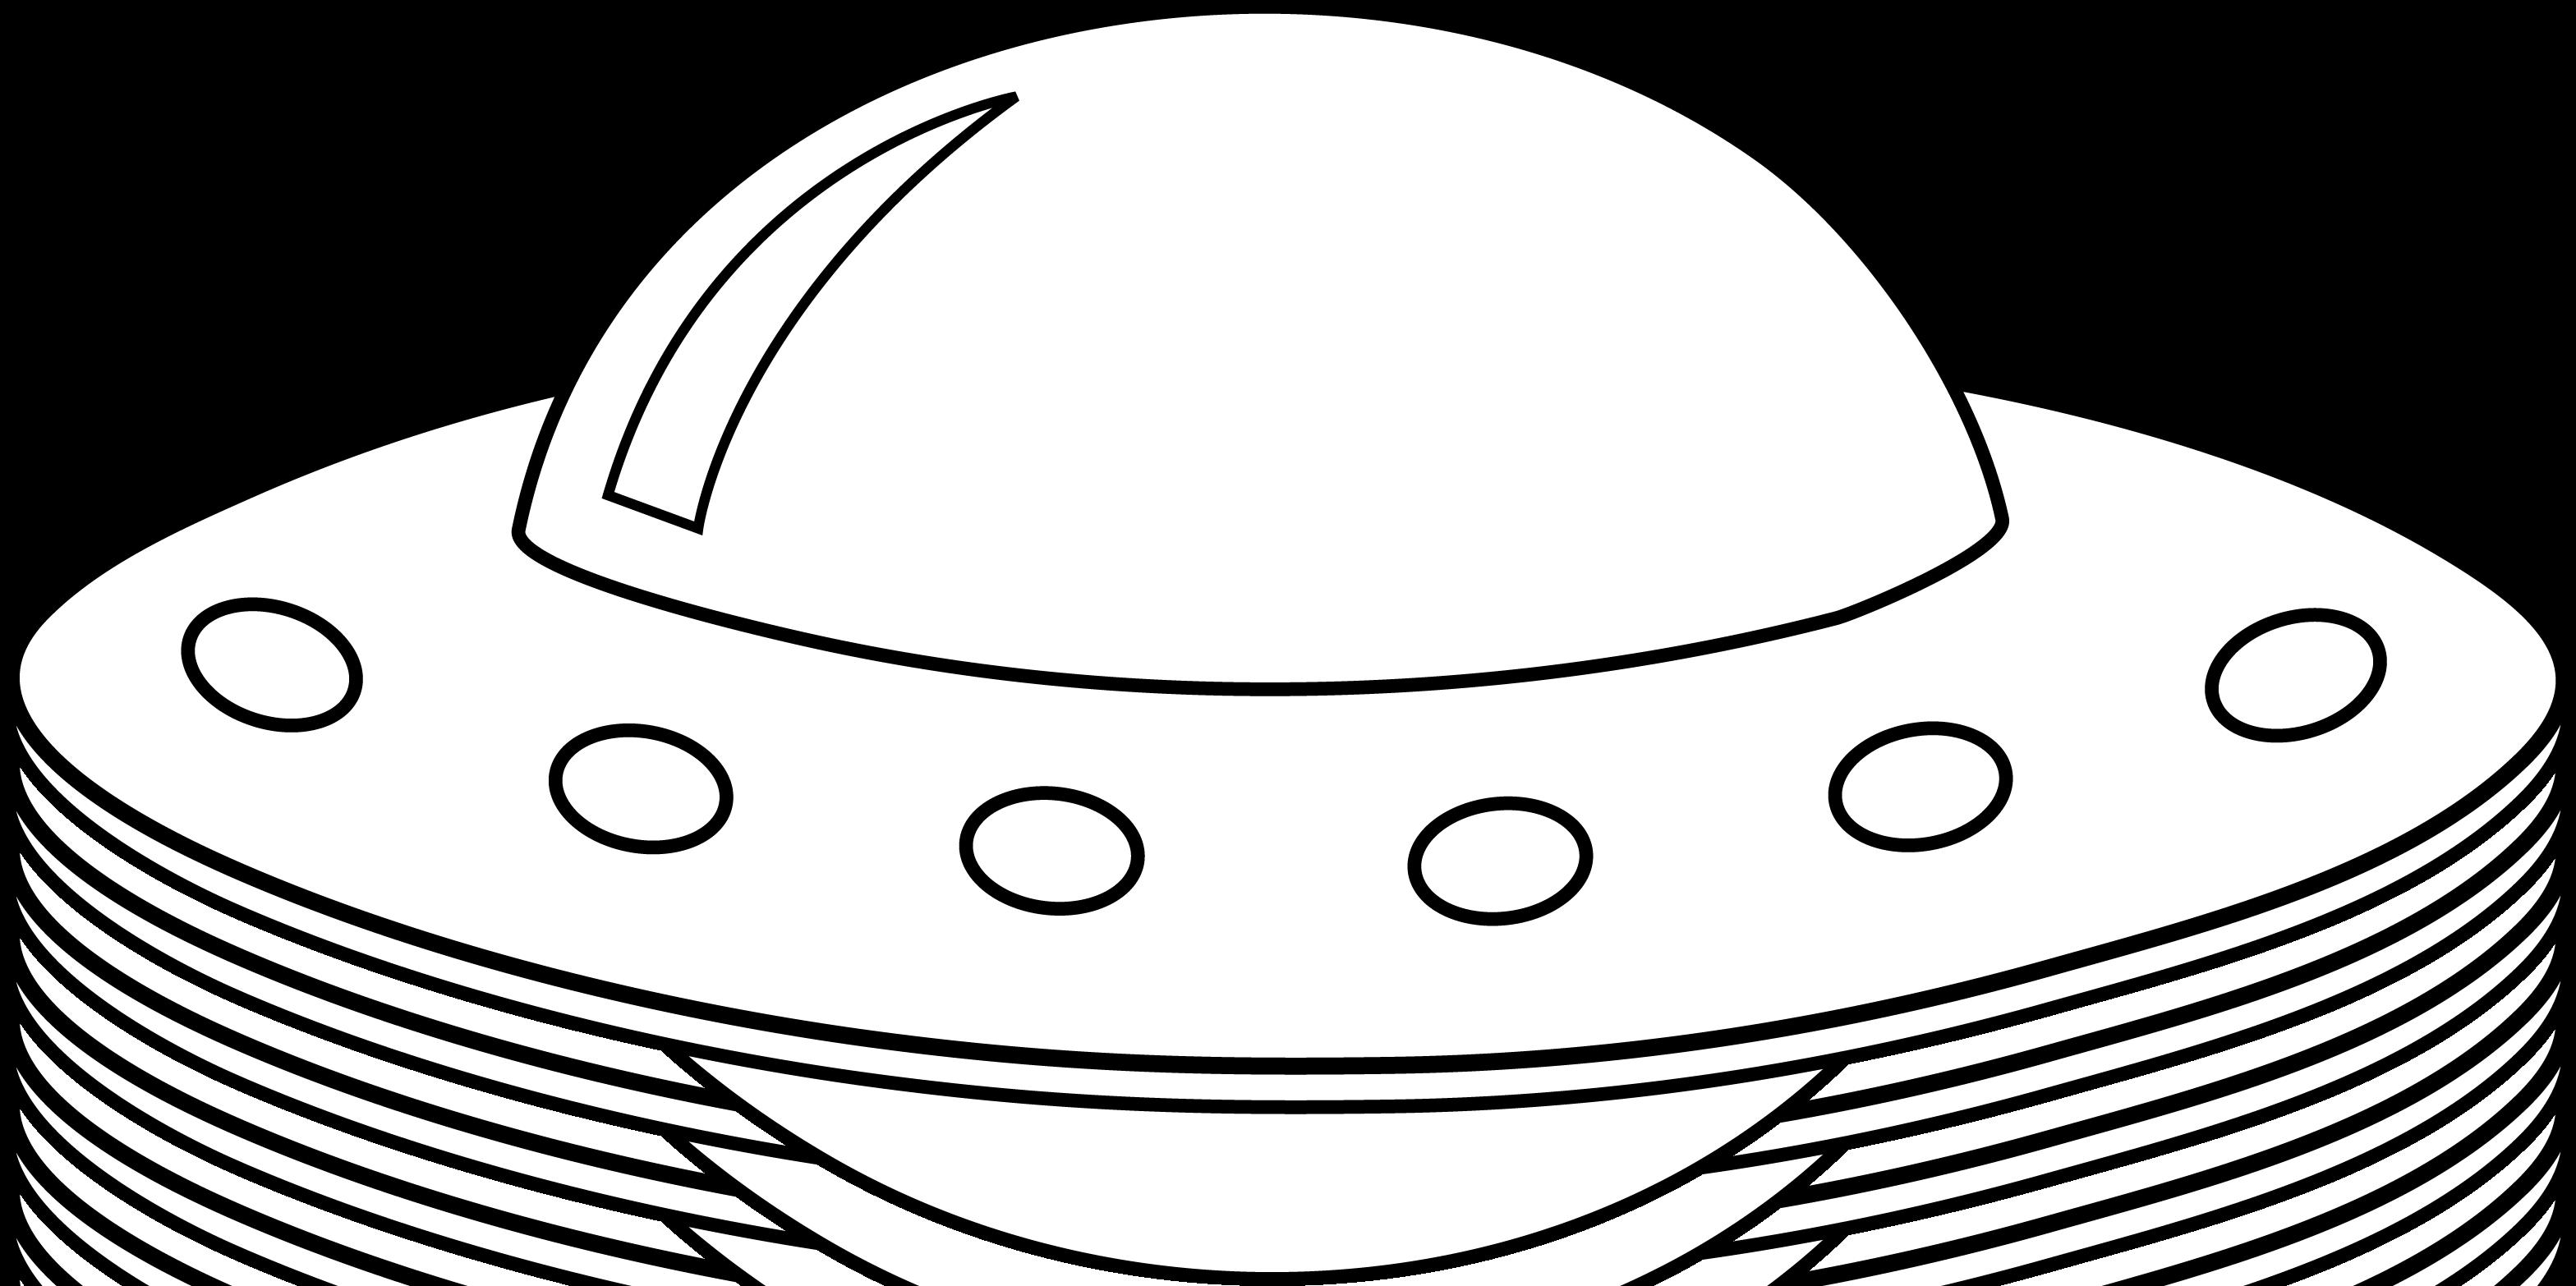 collection of alien. Ufo clipart line art